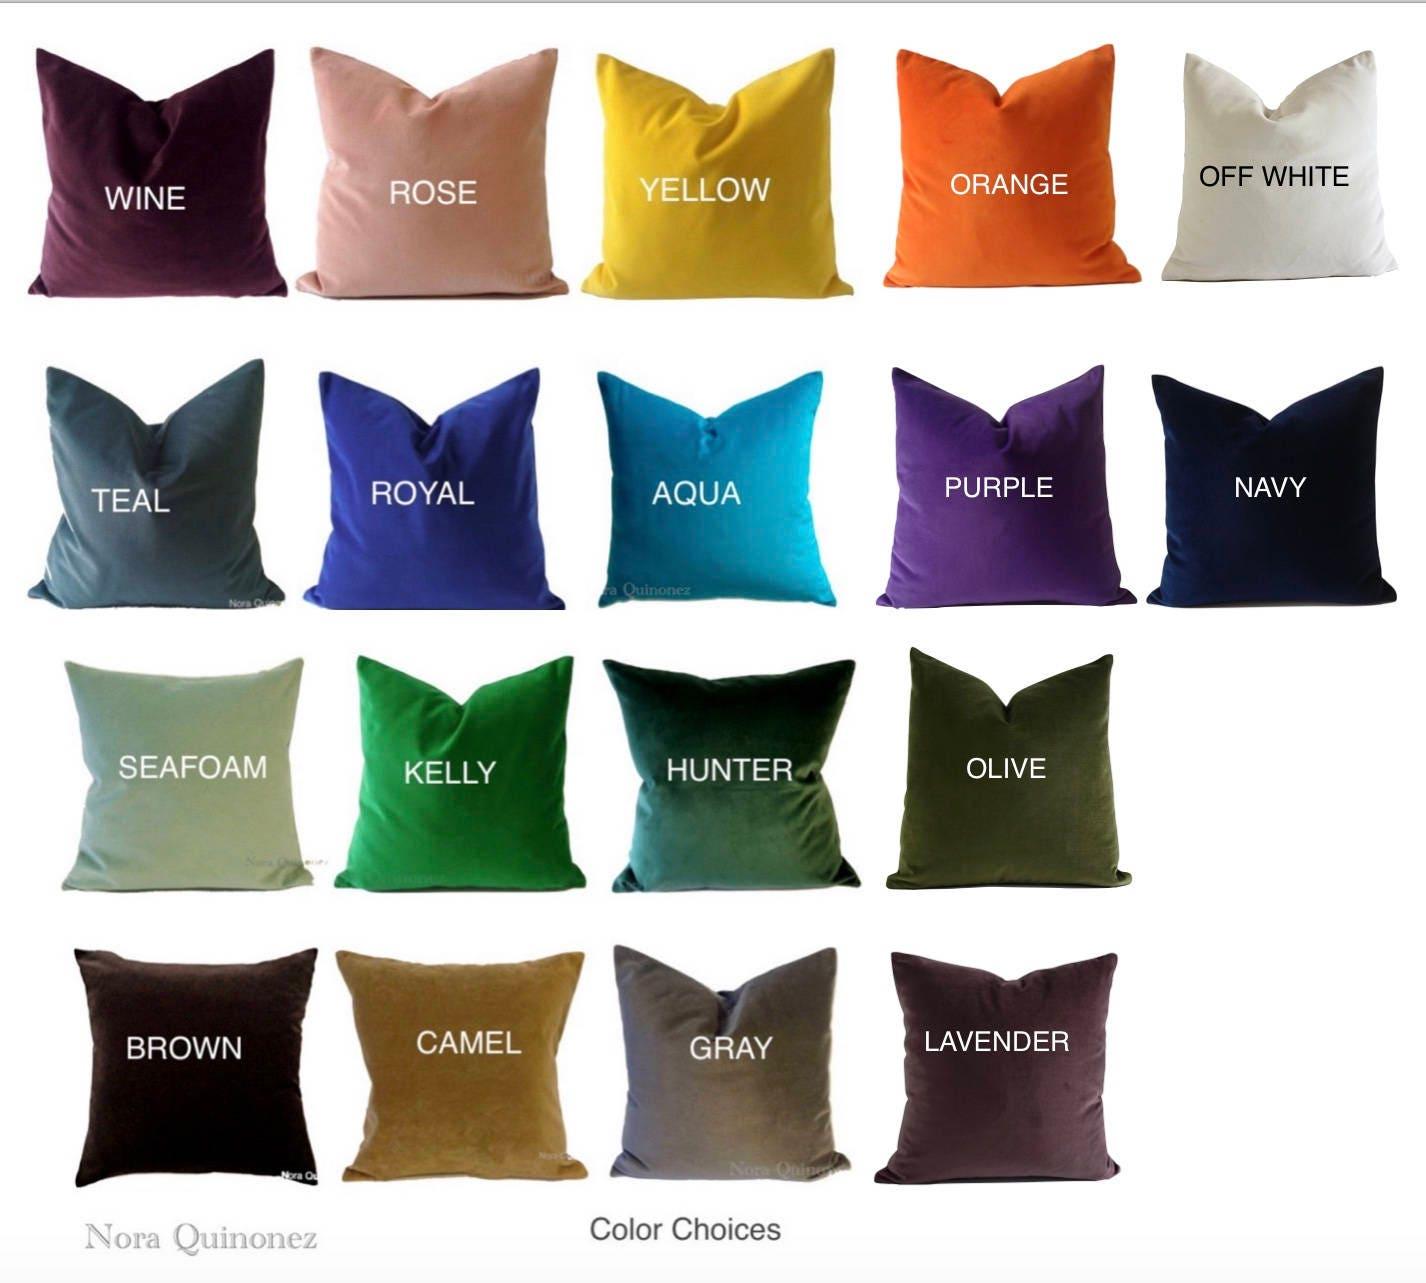 Decorative Velvet Pillow Cover -19 Color Choices- Accent Throw ...